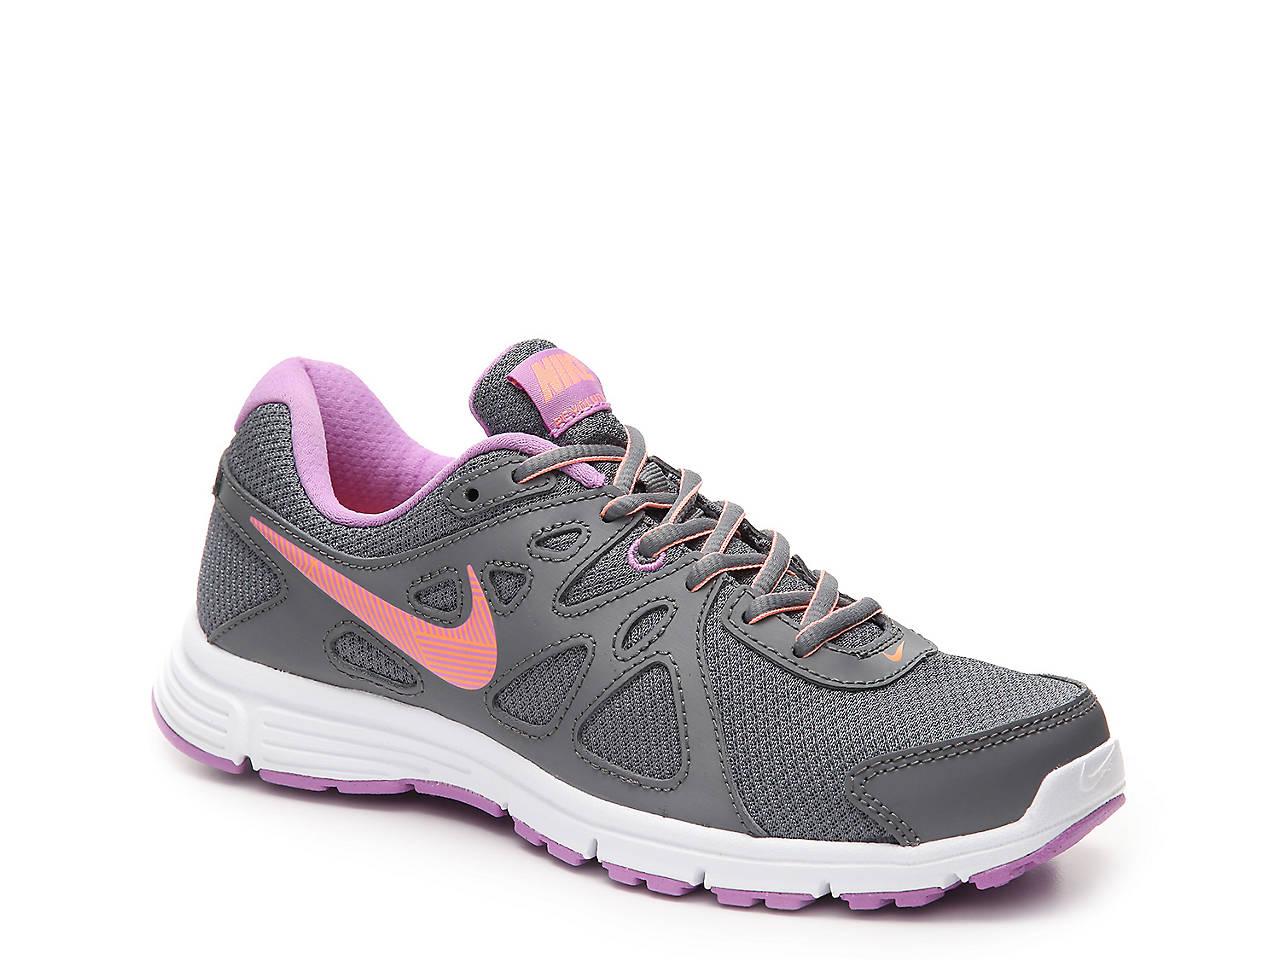 cb21f851 Revolution 2 Lightweight Running Shoe - Women's